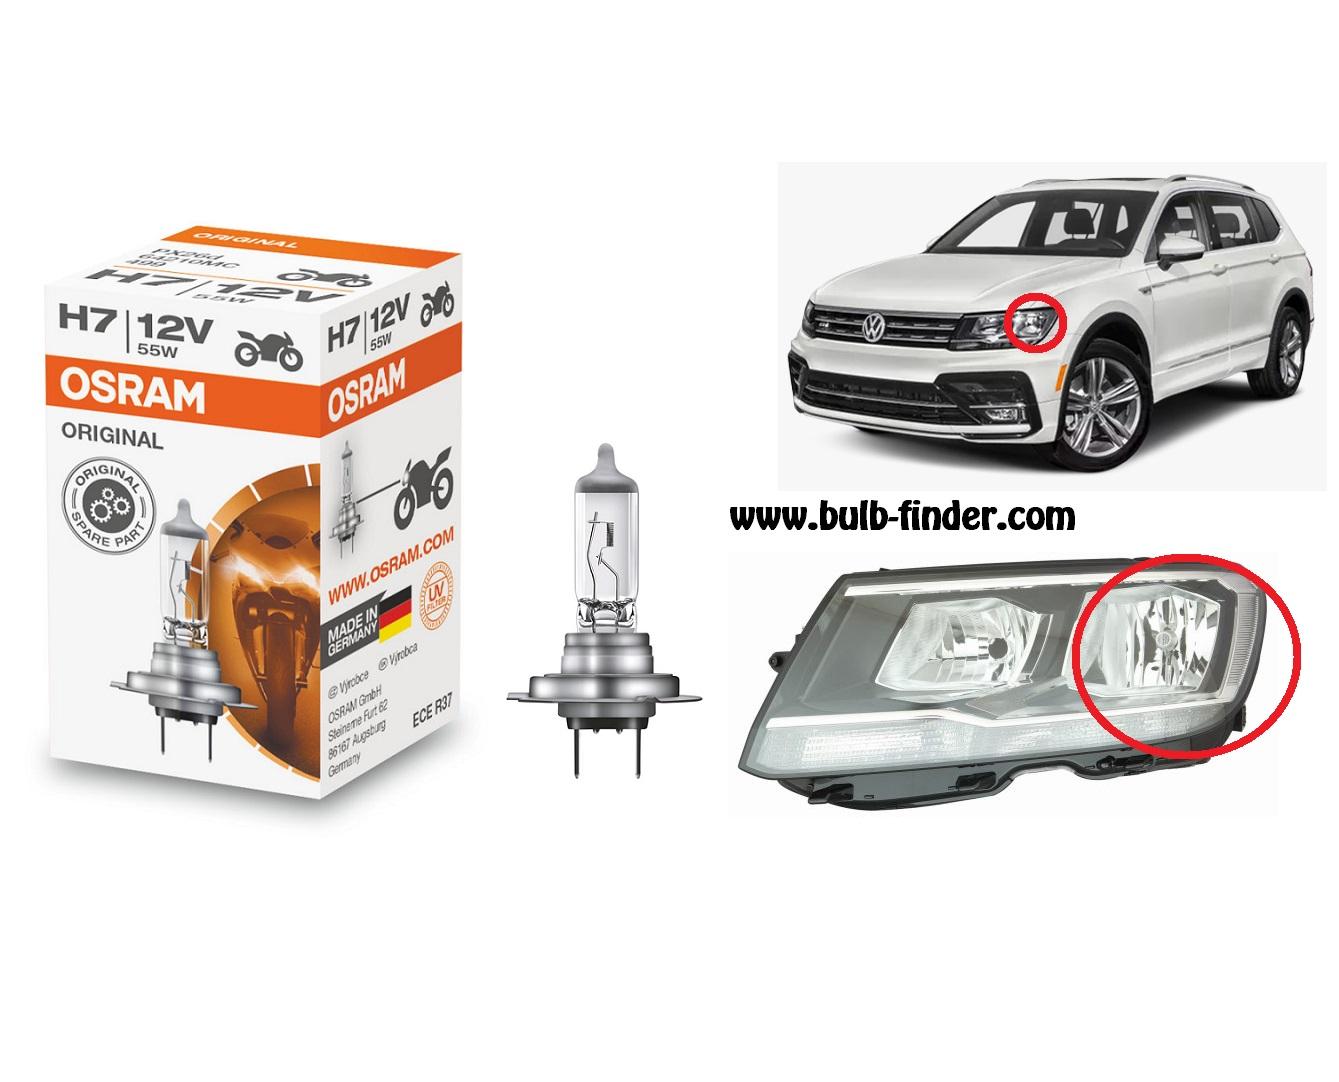 VW Tiguan model bulb for LOW BEAM HEADLIGHT specification